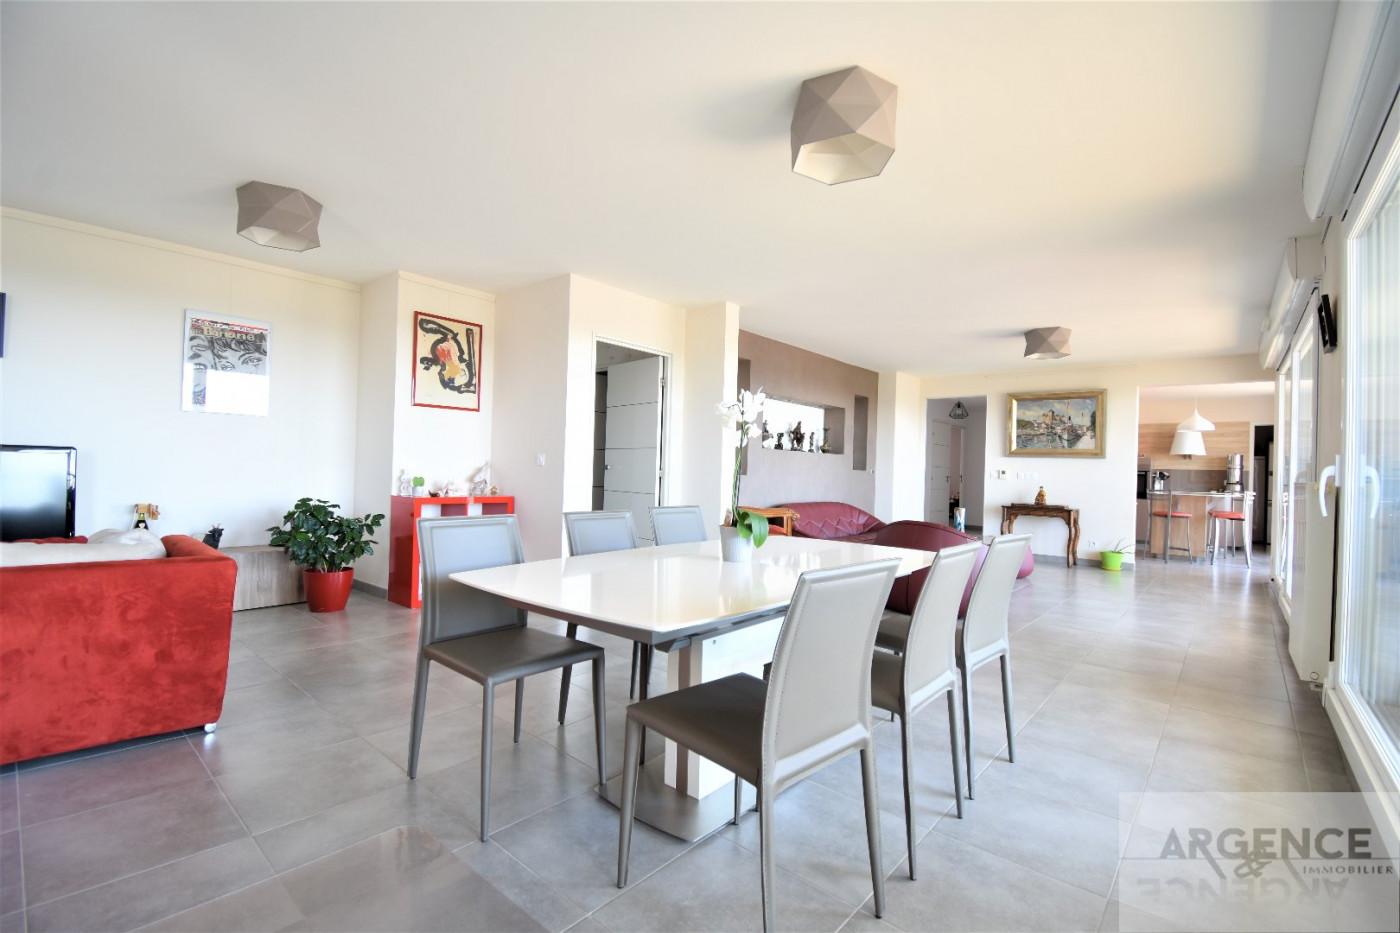 A vendre  Montpellier   Réf 345335795 - Argence immobilier